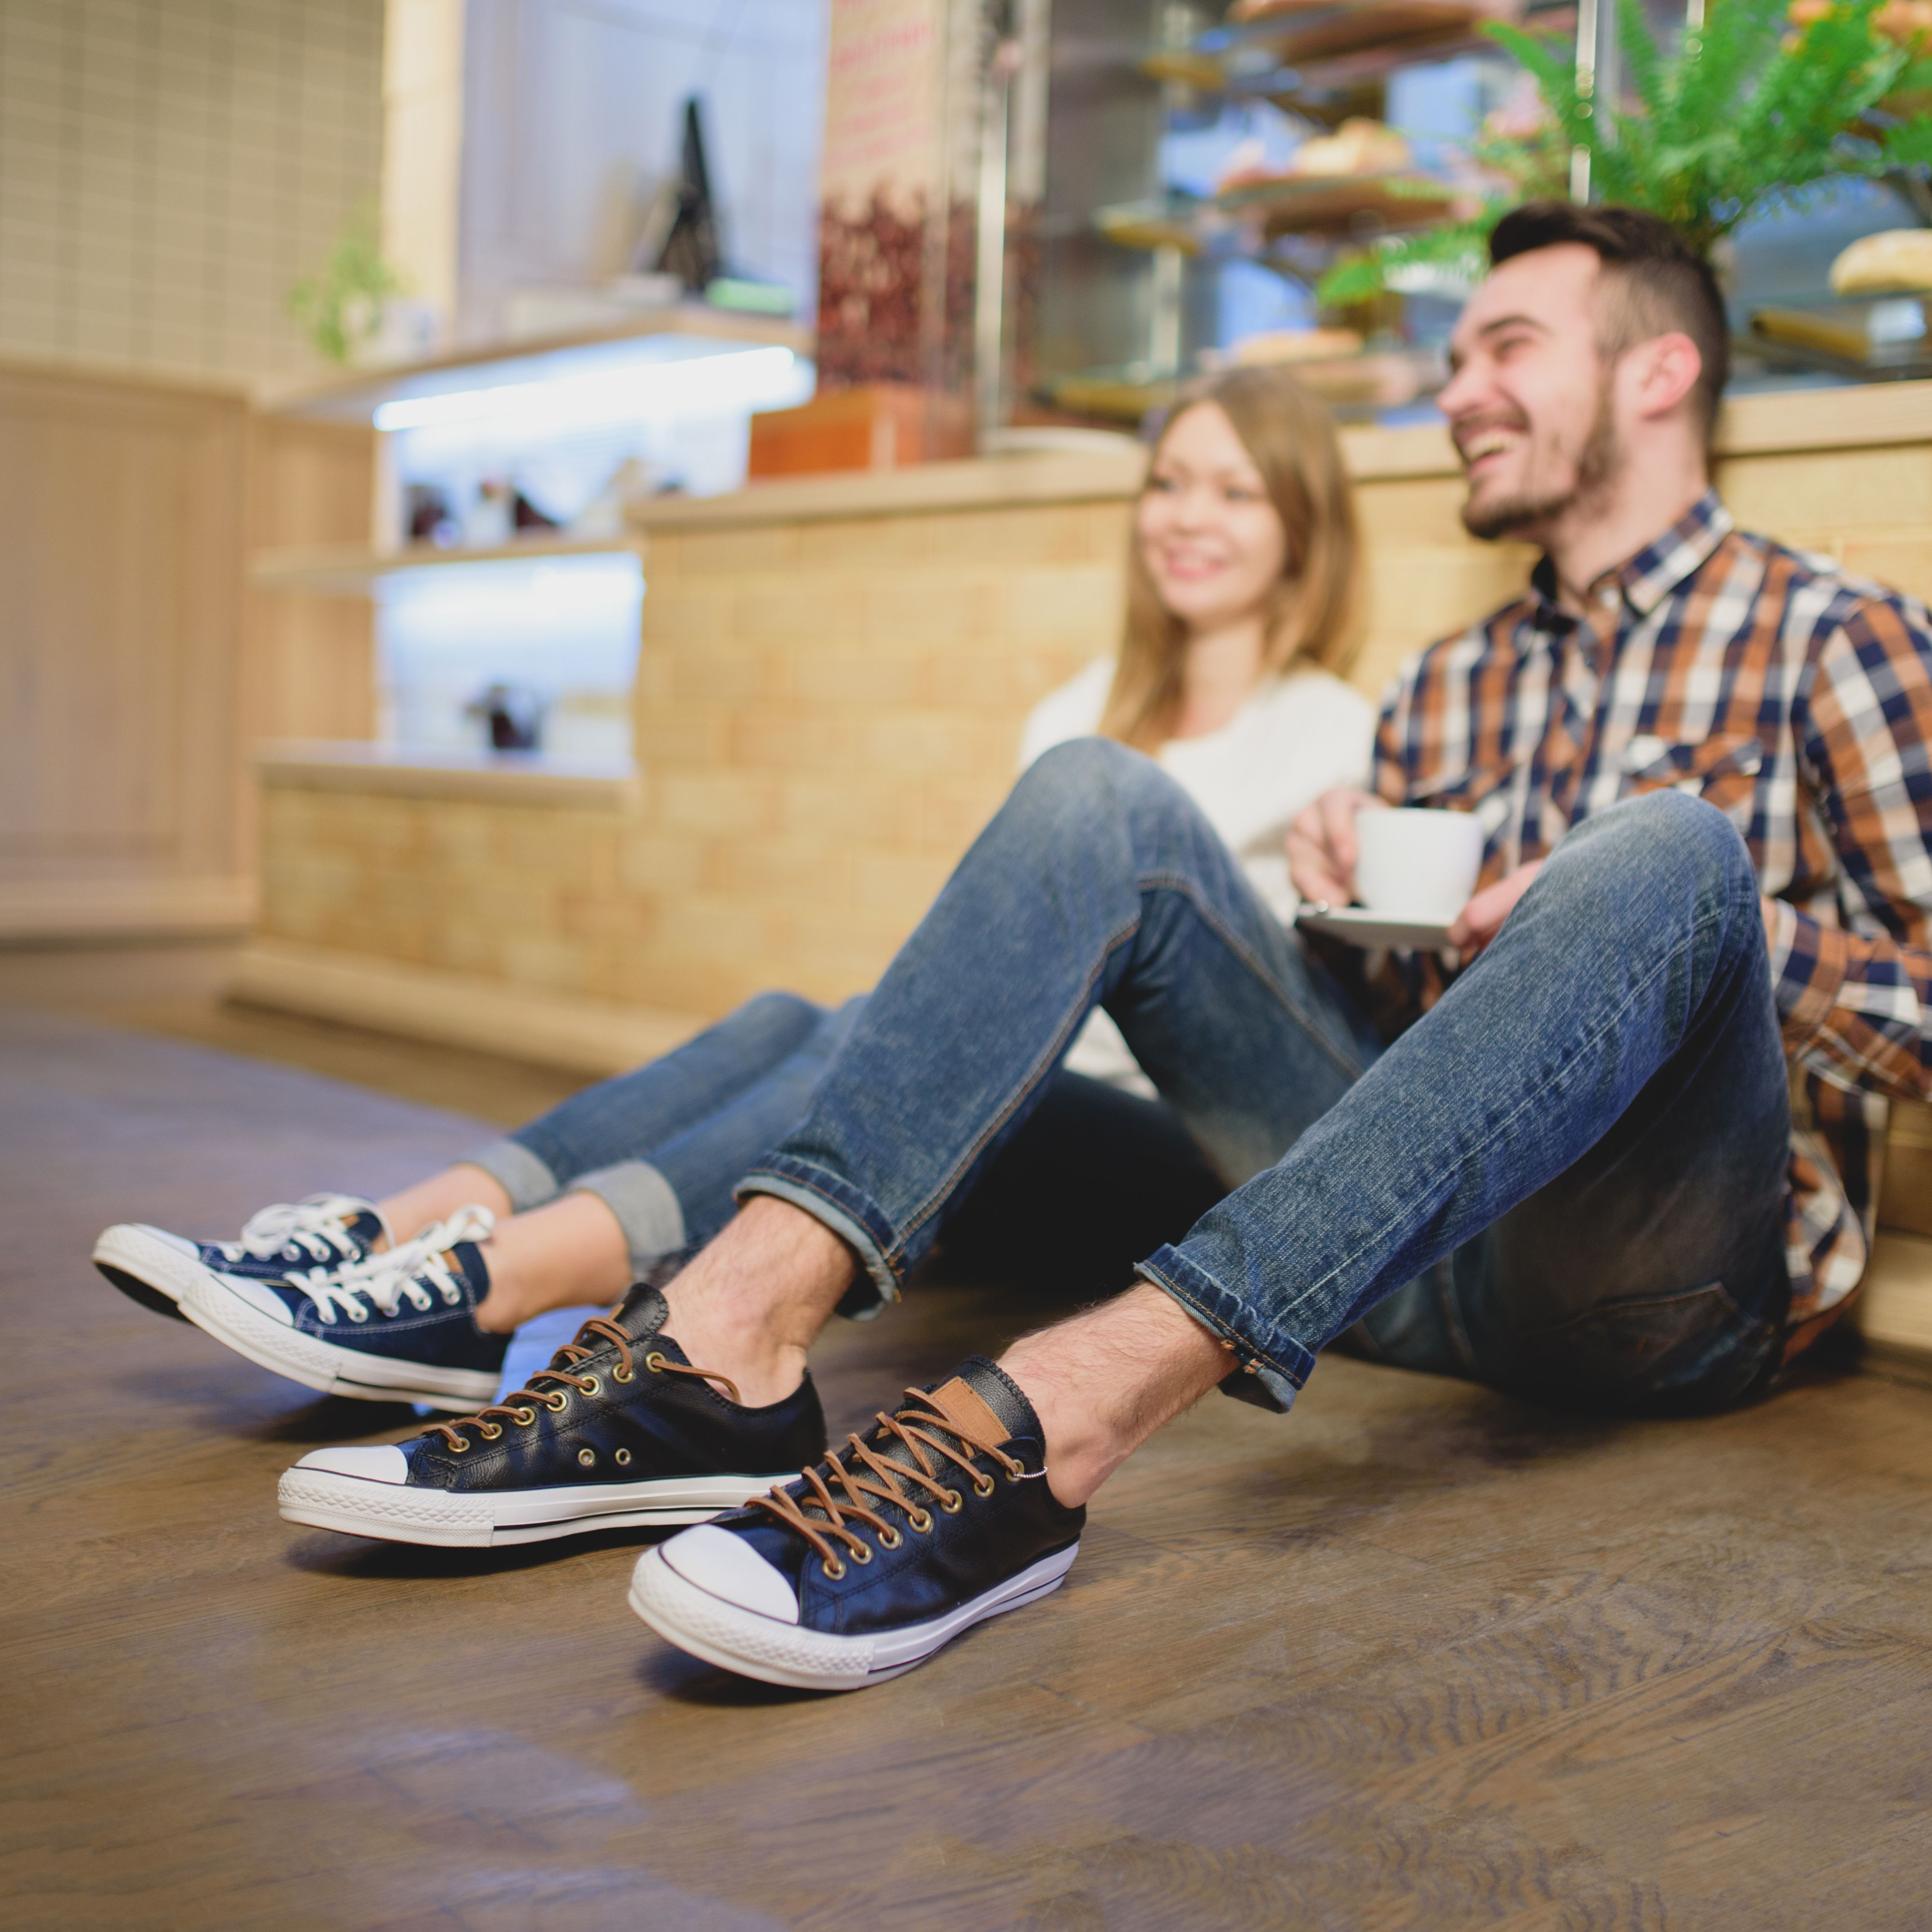 kedoff_netCanvas shoes Las Espadrillas #kedoff #kedoffnet #lasespadrillas #denim #canasshoes #unisex #footwear #shoes #trampki #ukraine #forpeople #kicks #fashion #fashioninsta #urban #instagood #cute #beautiful #awesome #ootd #vsco #vscocam #kickstagram #brand #branding